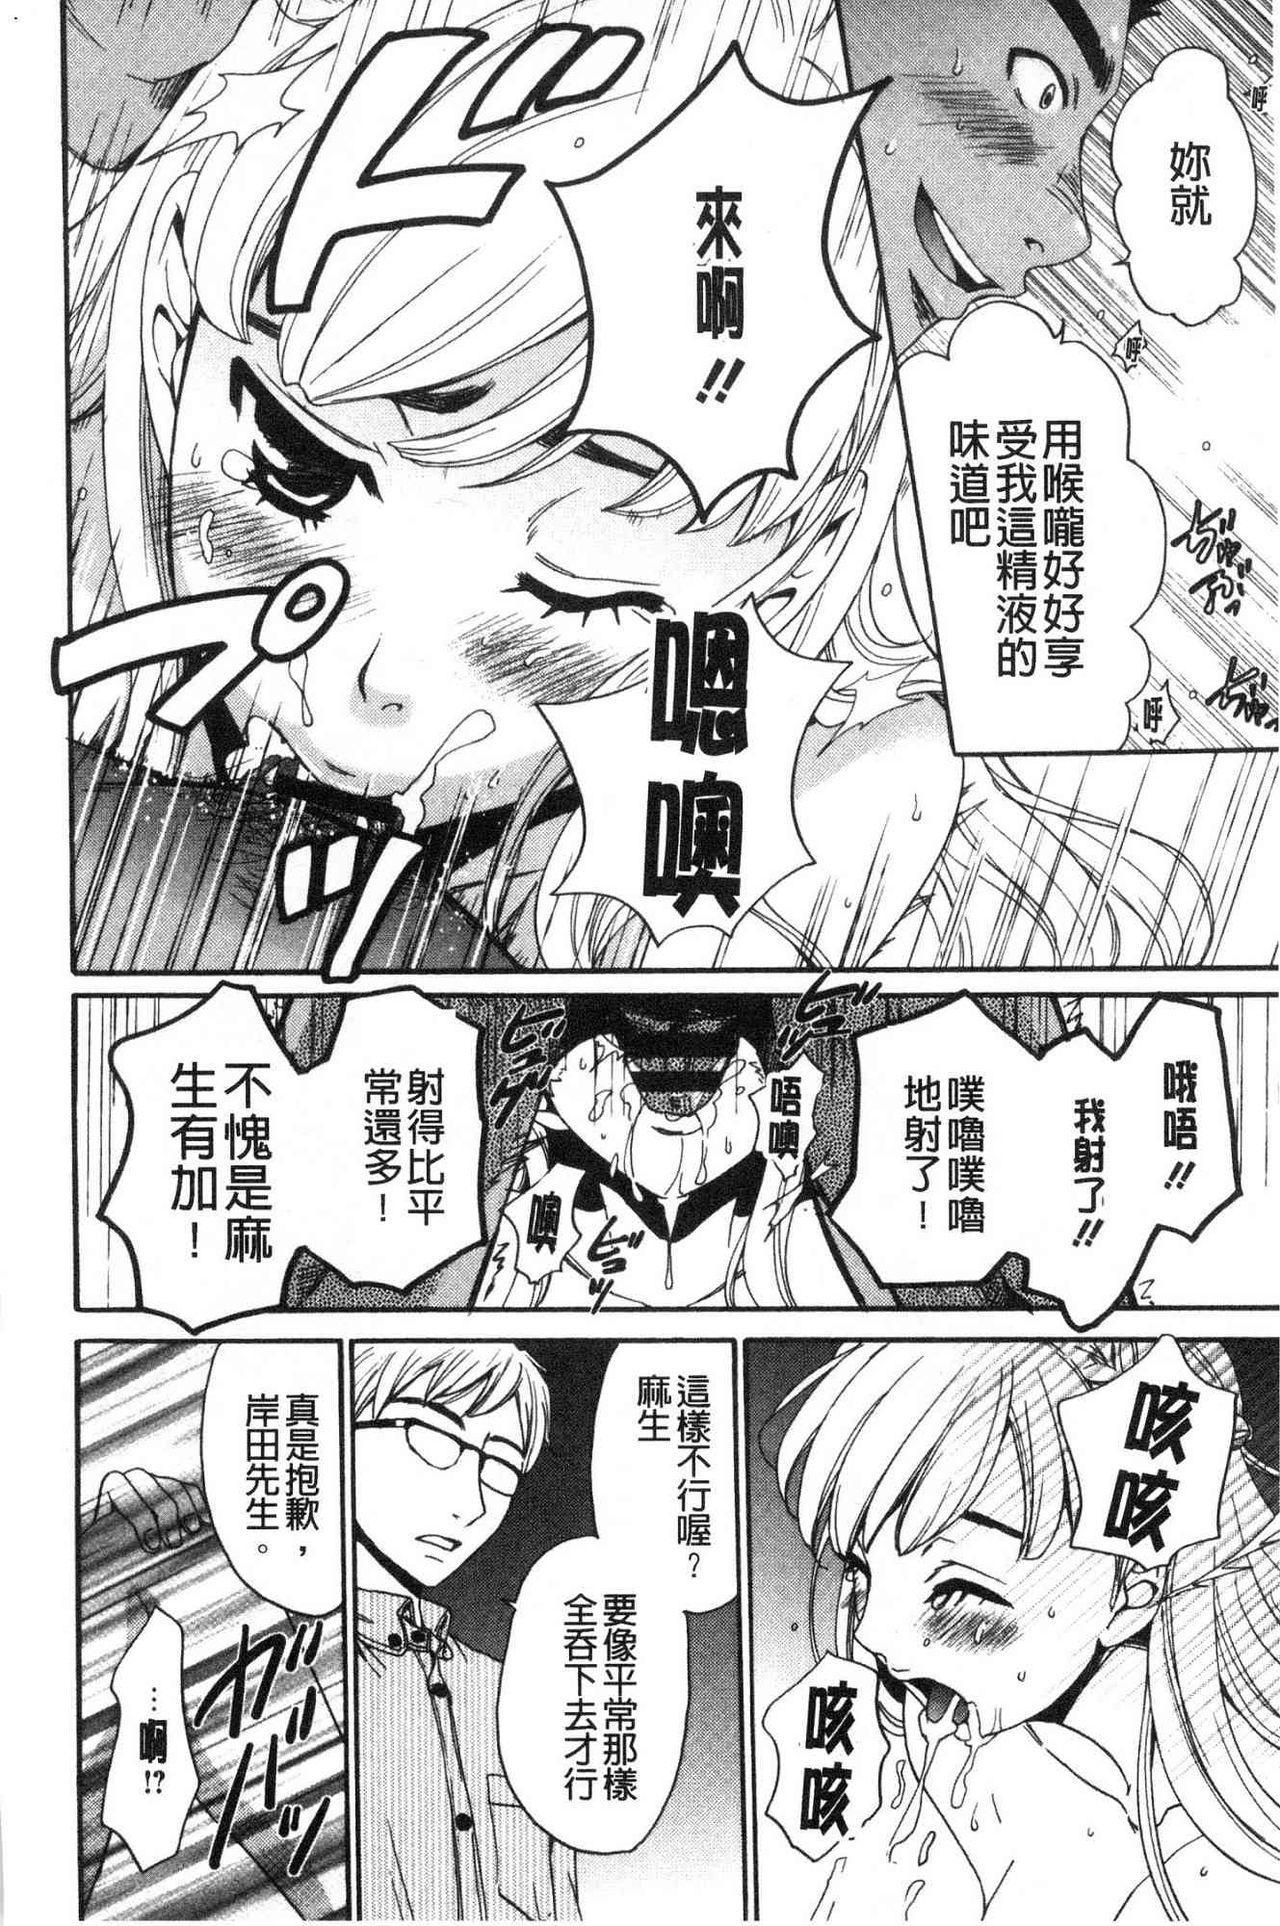 [Gotoh Akira]  21-ji no Onna ~Camera no Mae no Mesuinu~ 2 | 21時之女 ~鏡頭前的牝犬~ 2 [Chinese] 21